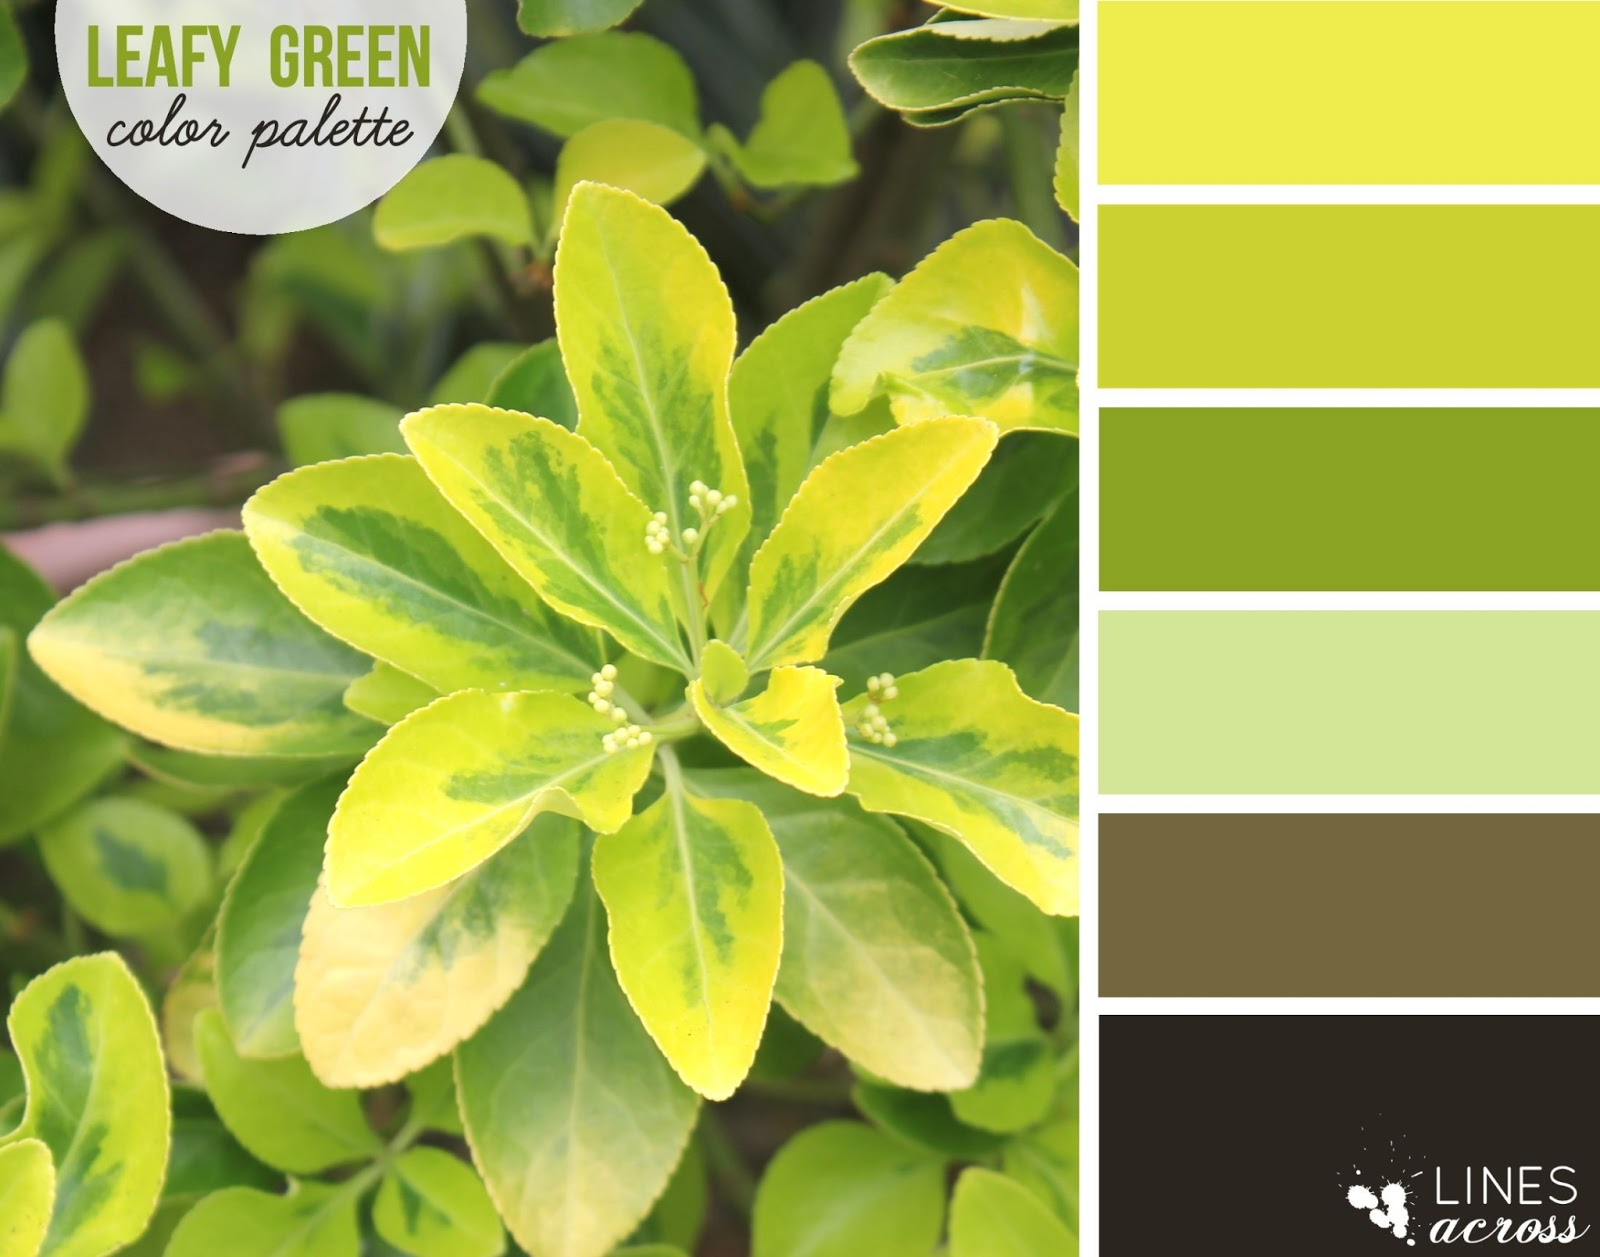 Leafy Green Color Palette